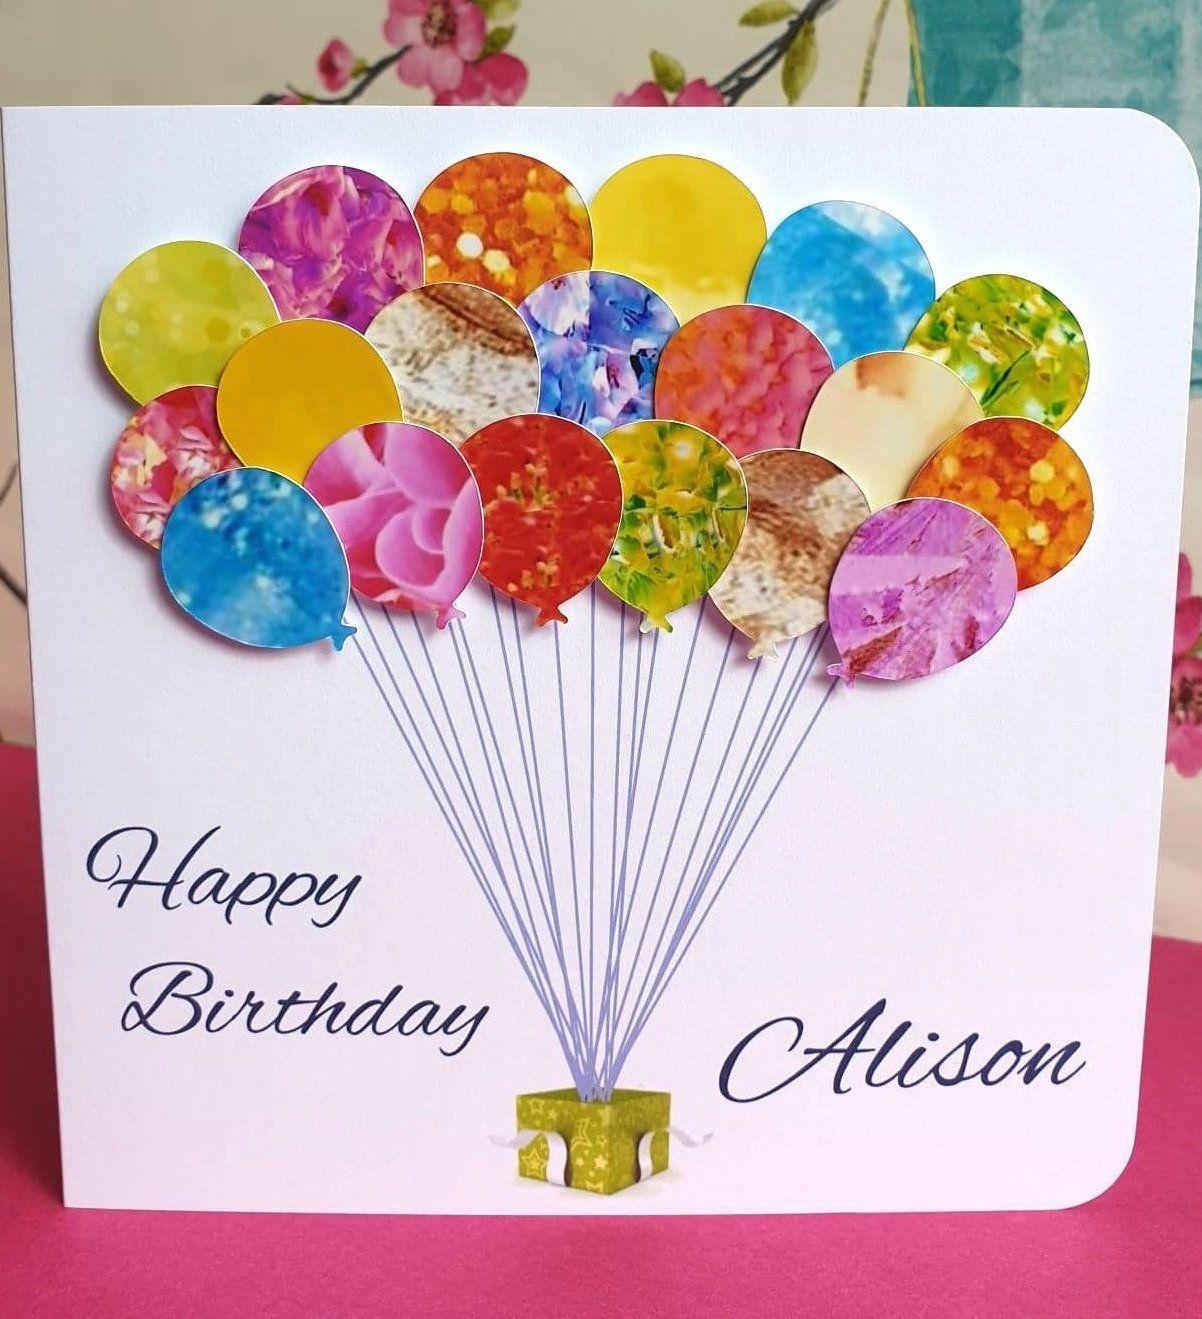 Personalised Birthday Card Handmade Custom Birthday Balloons Etsy Handmade Birthday Cards 90th Birthday Cards 60th Birthday Cards